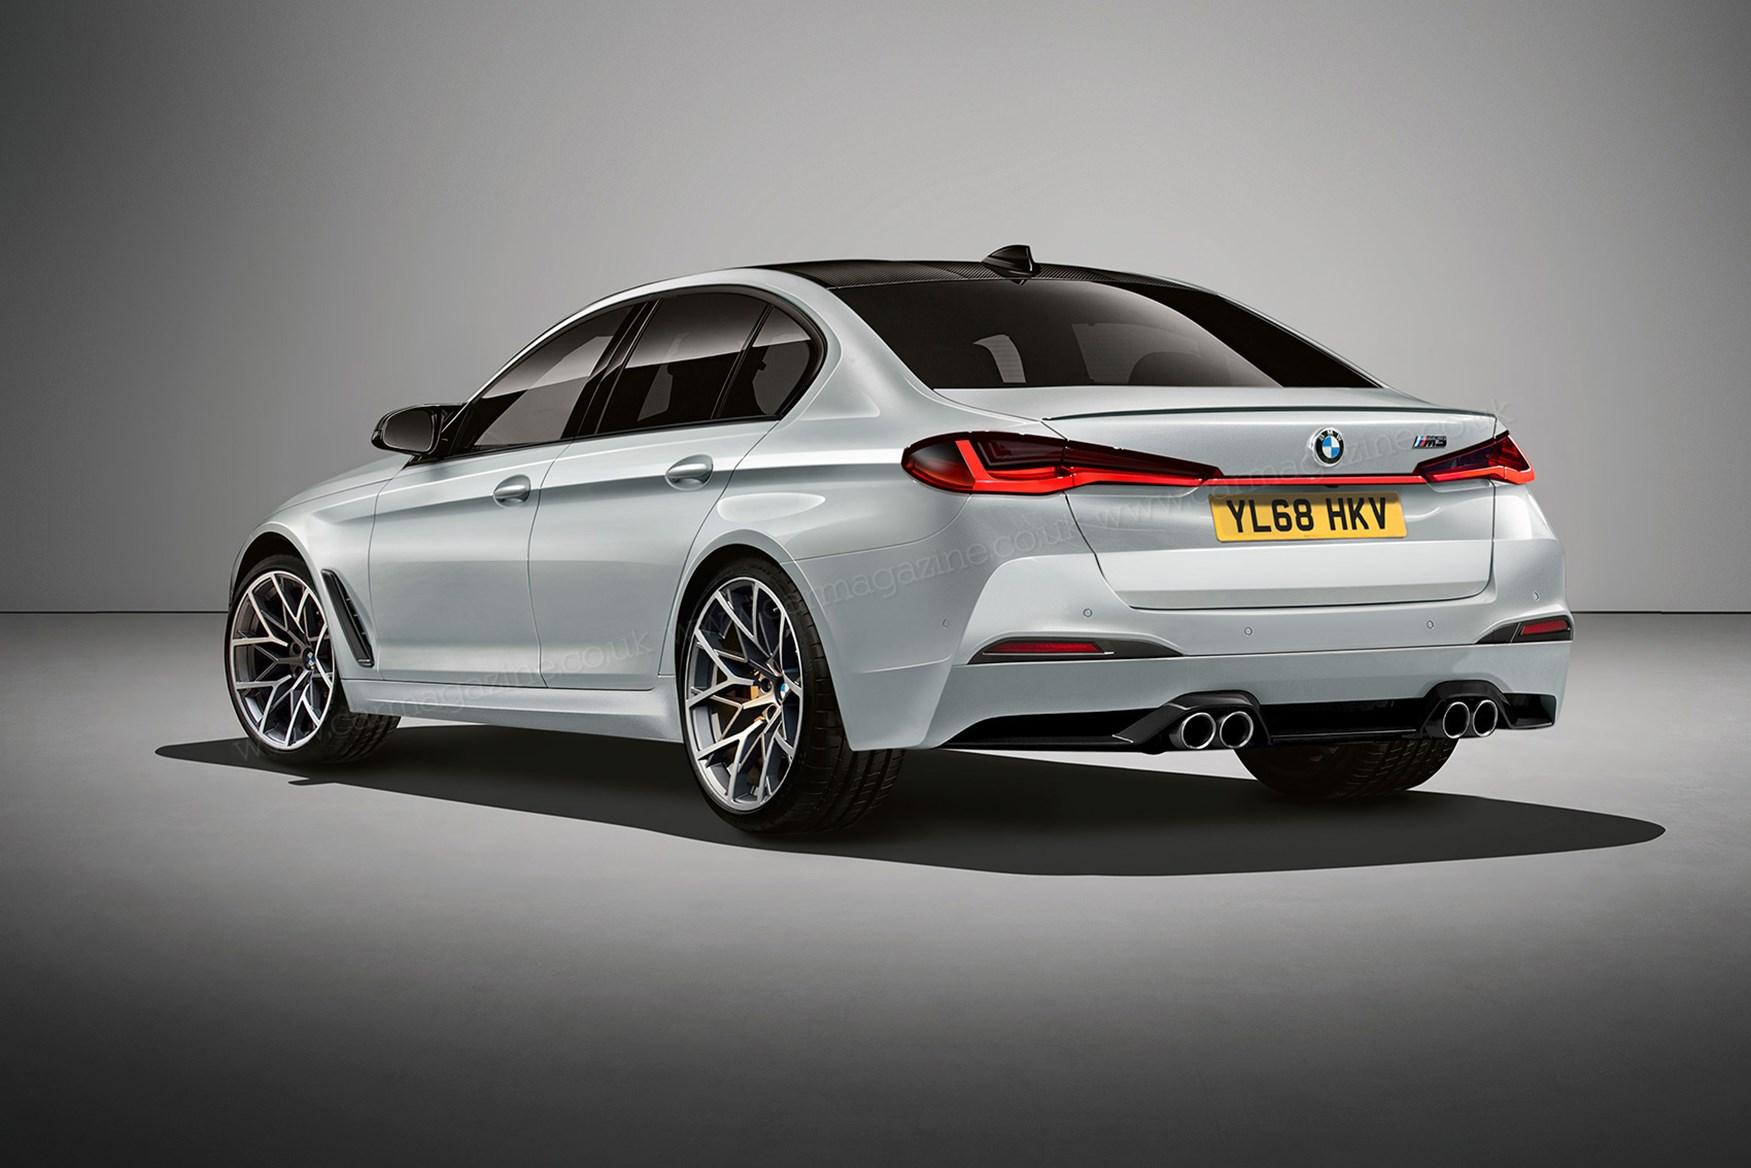 New 2020 Bmw M3 Codenamed G80 Revealed By Car Magazine